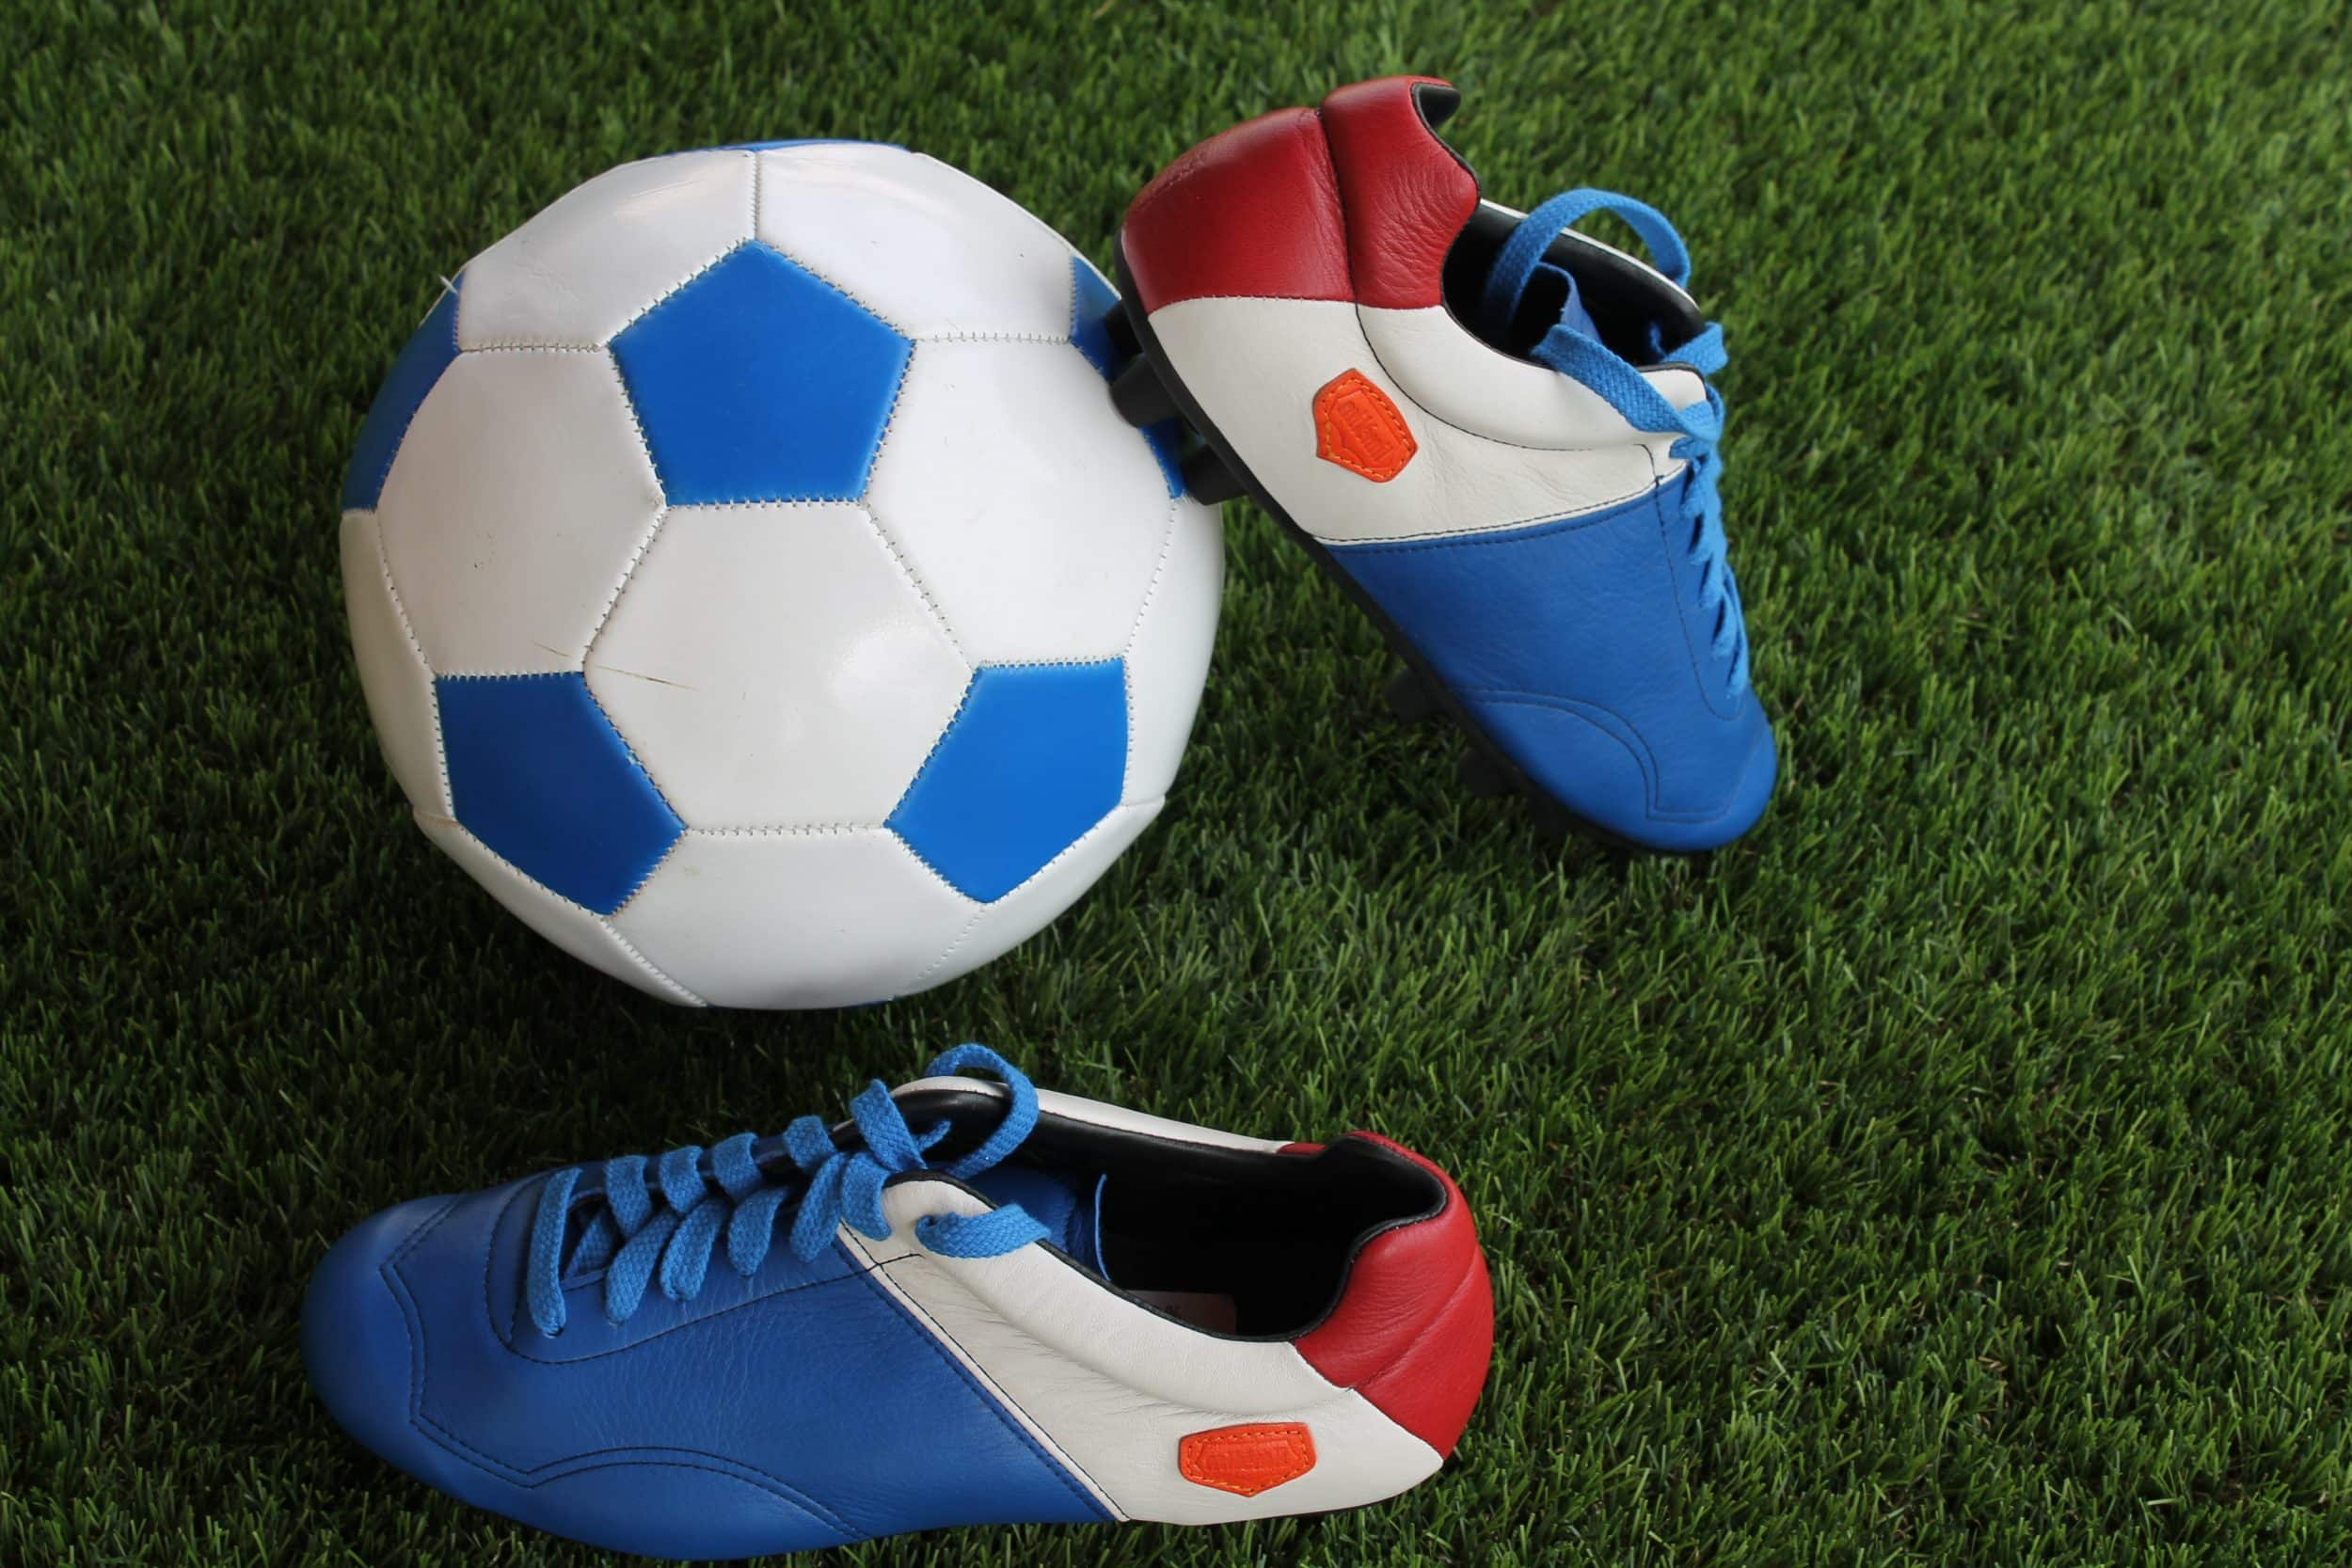 test-chaussures-milemil-infatigable-france-6